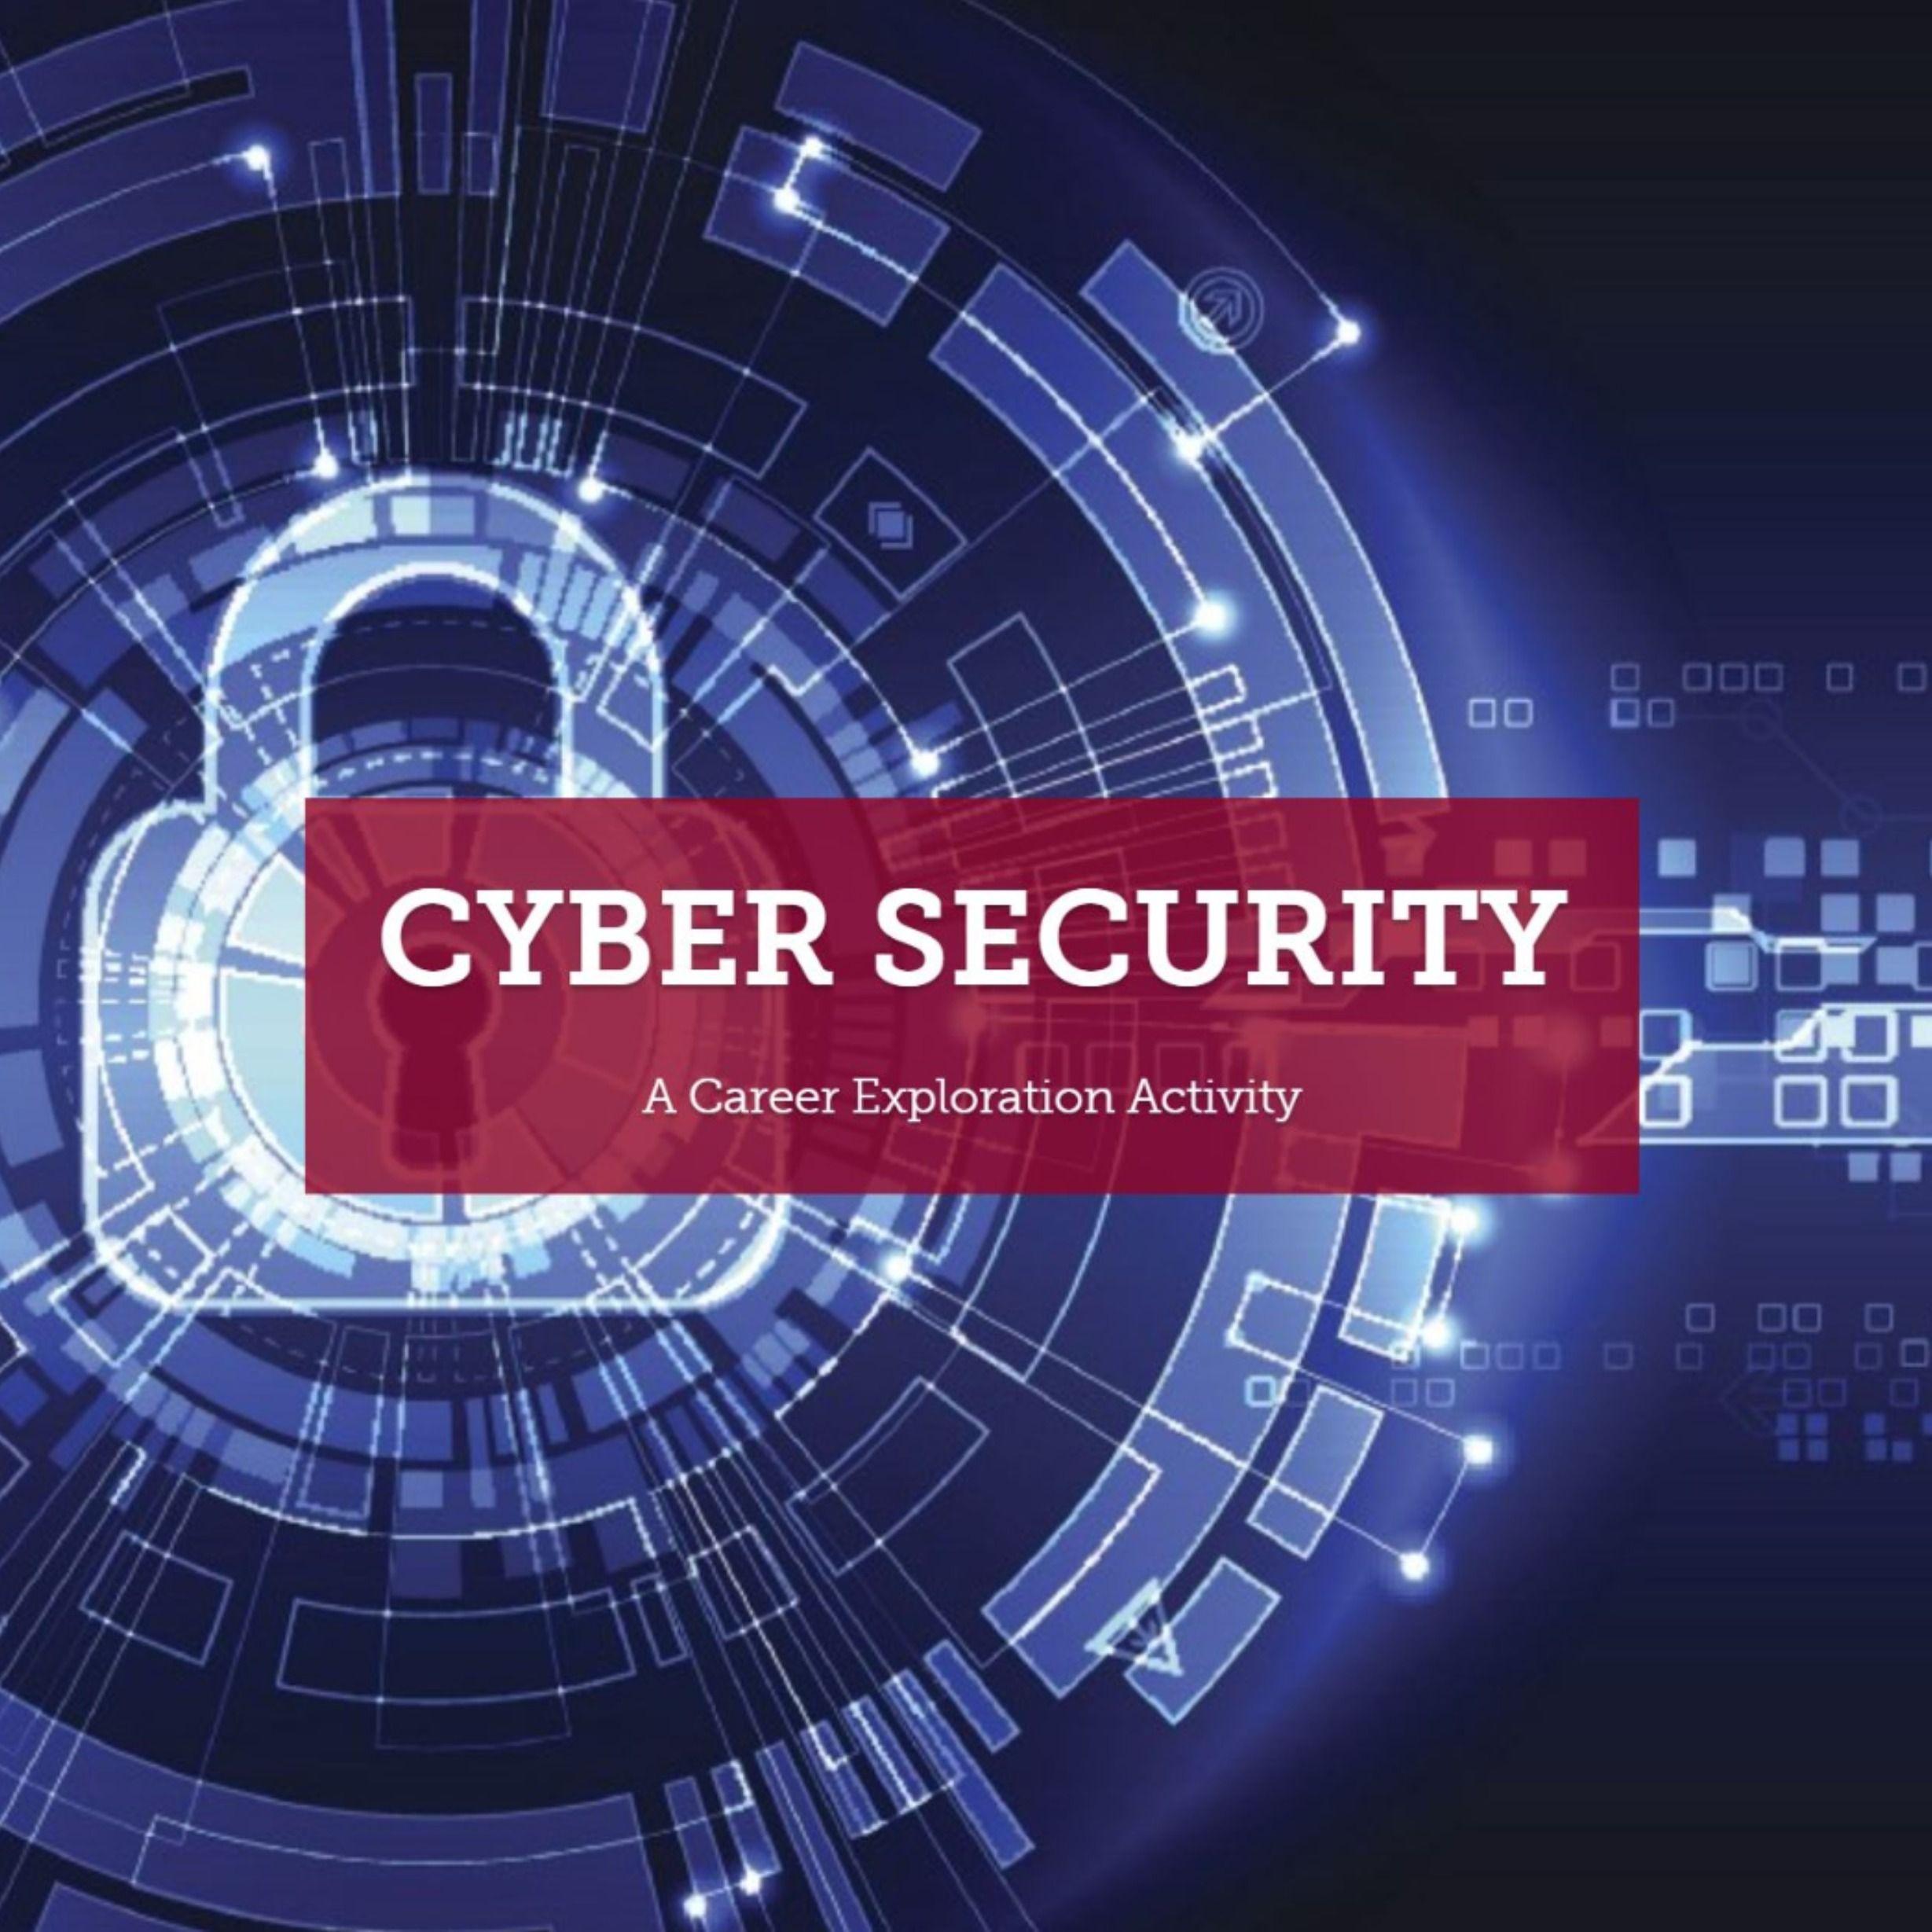 Cyber Security In 2021 Career Exploration Activities Career Exploration Digital Classroom